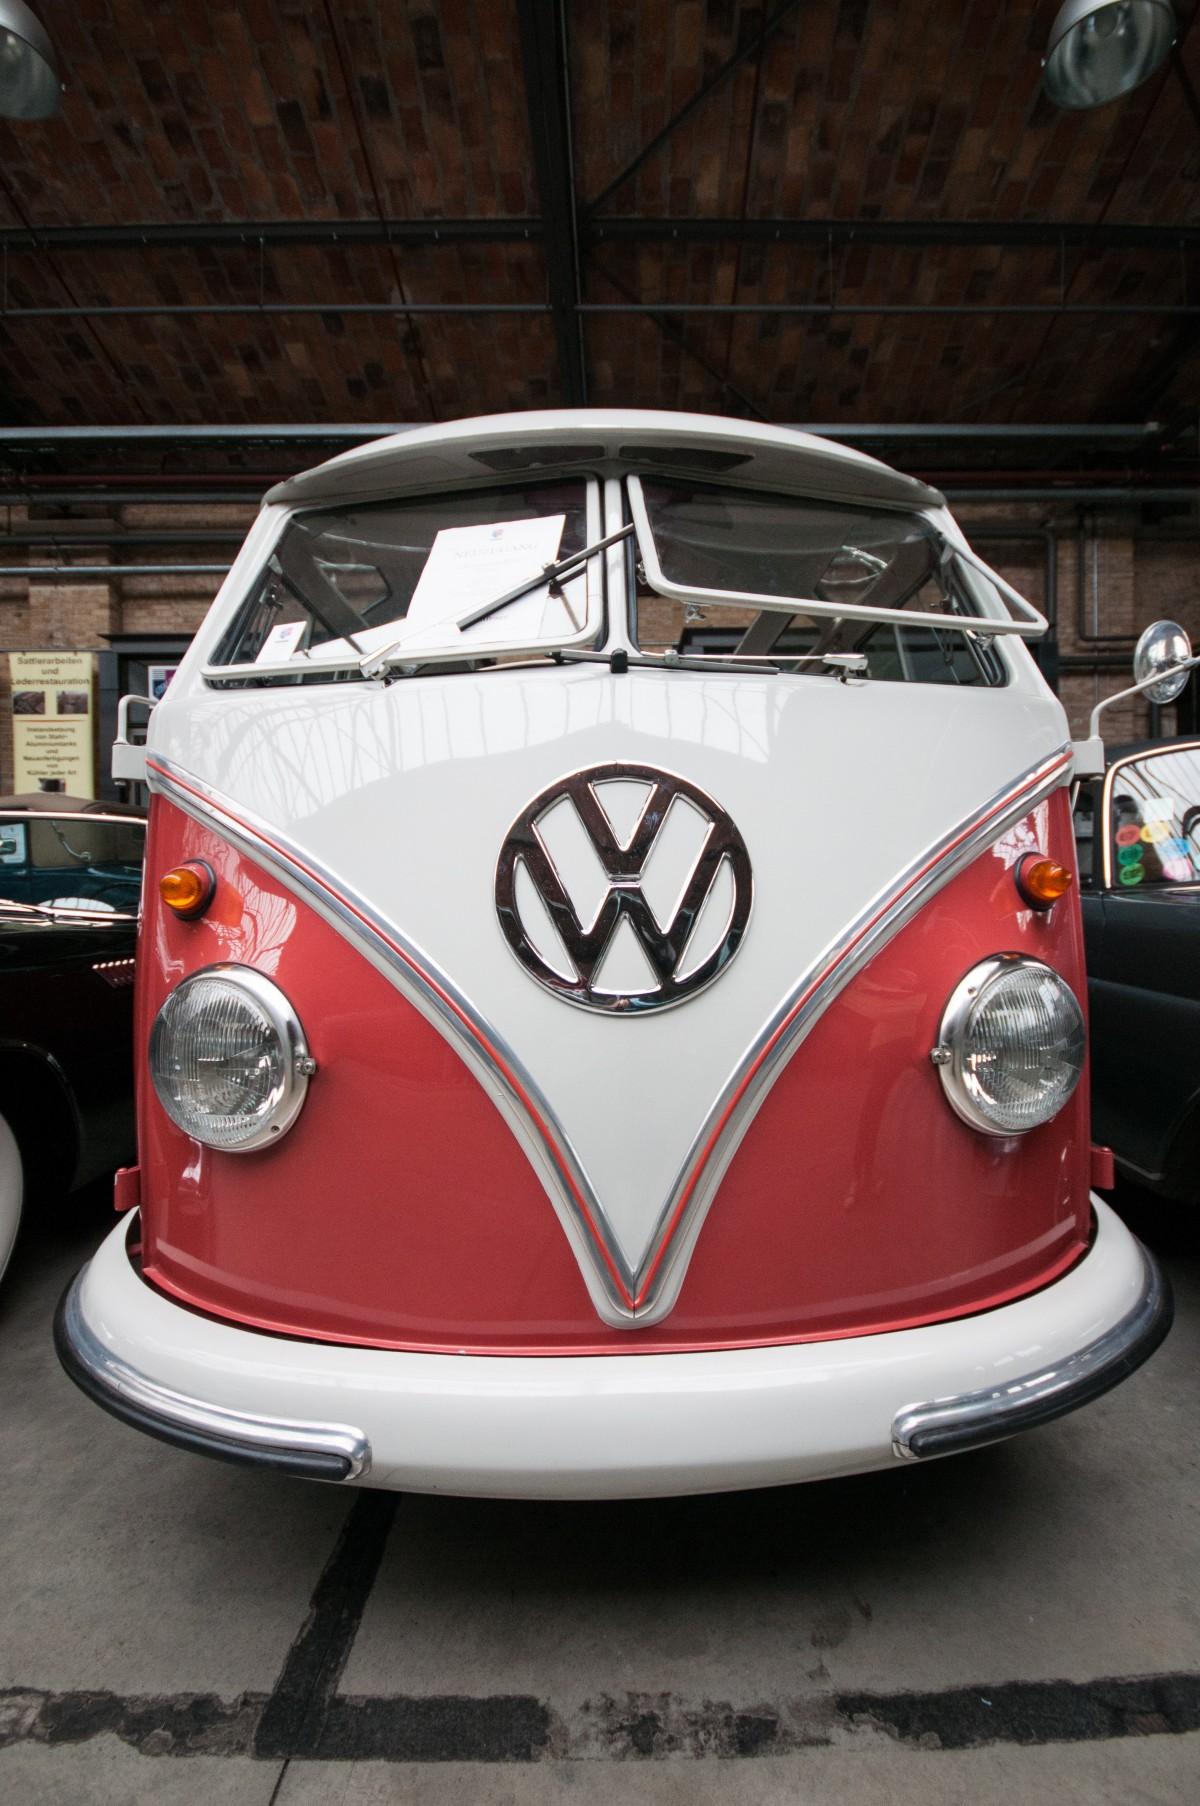 Free Images : black and white, wheel, transportation, auto, toy, motor vehicle, vintage car ...